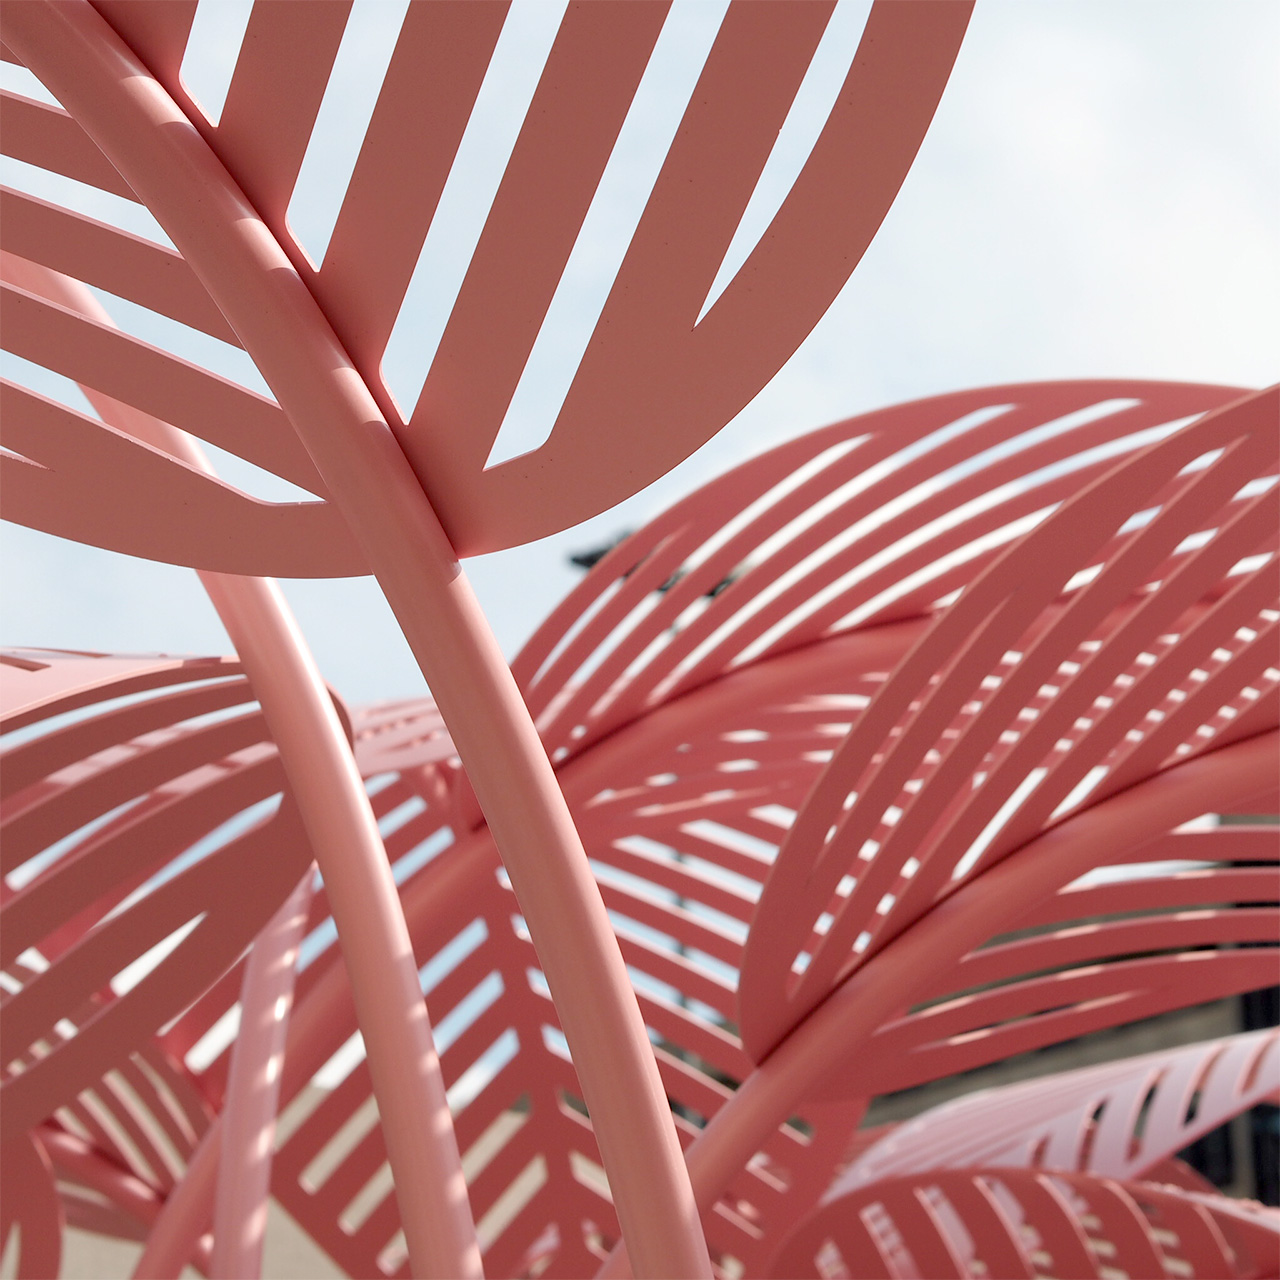 Milan Design Week 2017: Wallpaper's Temple of Divine Design